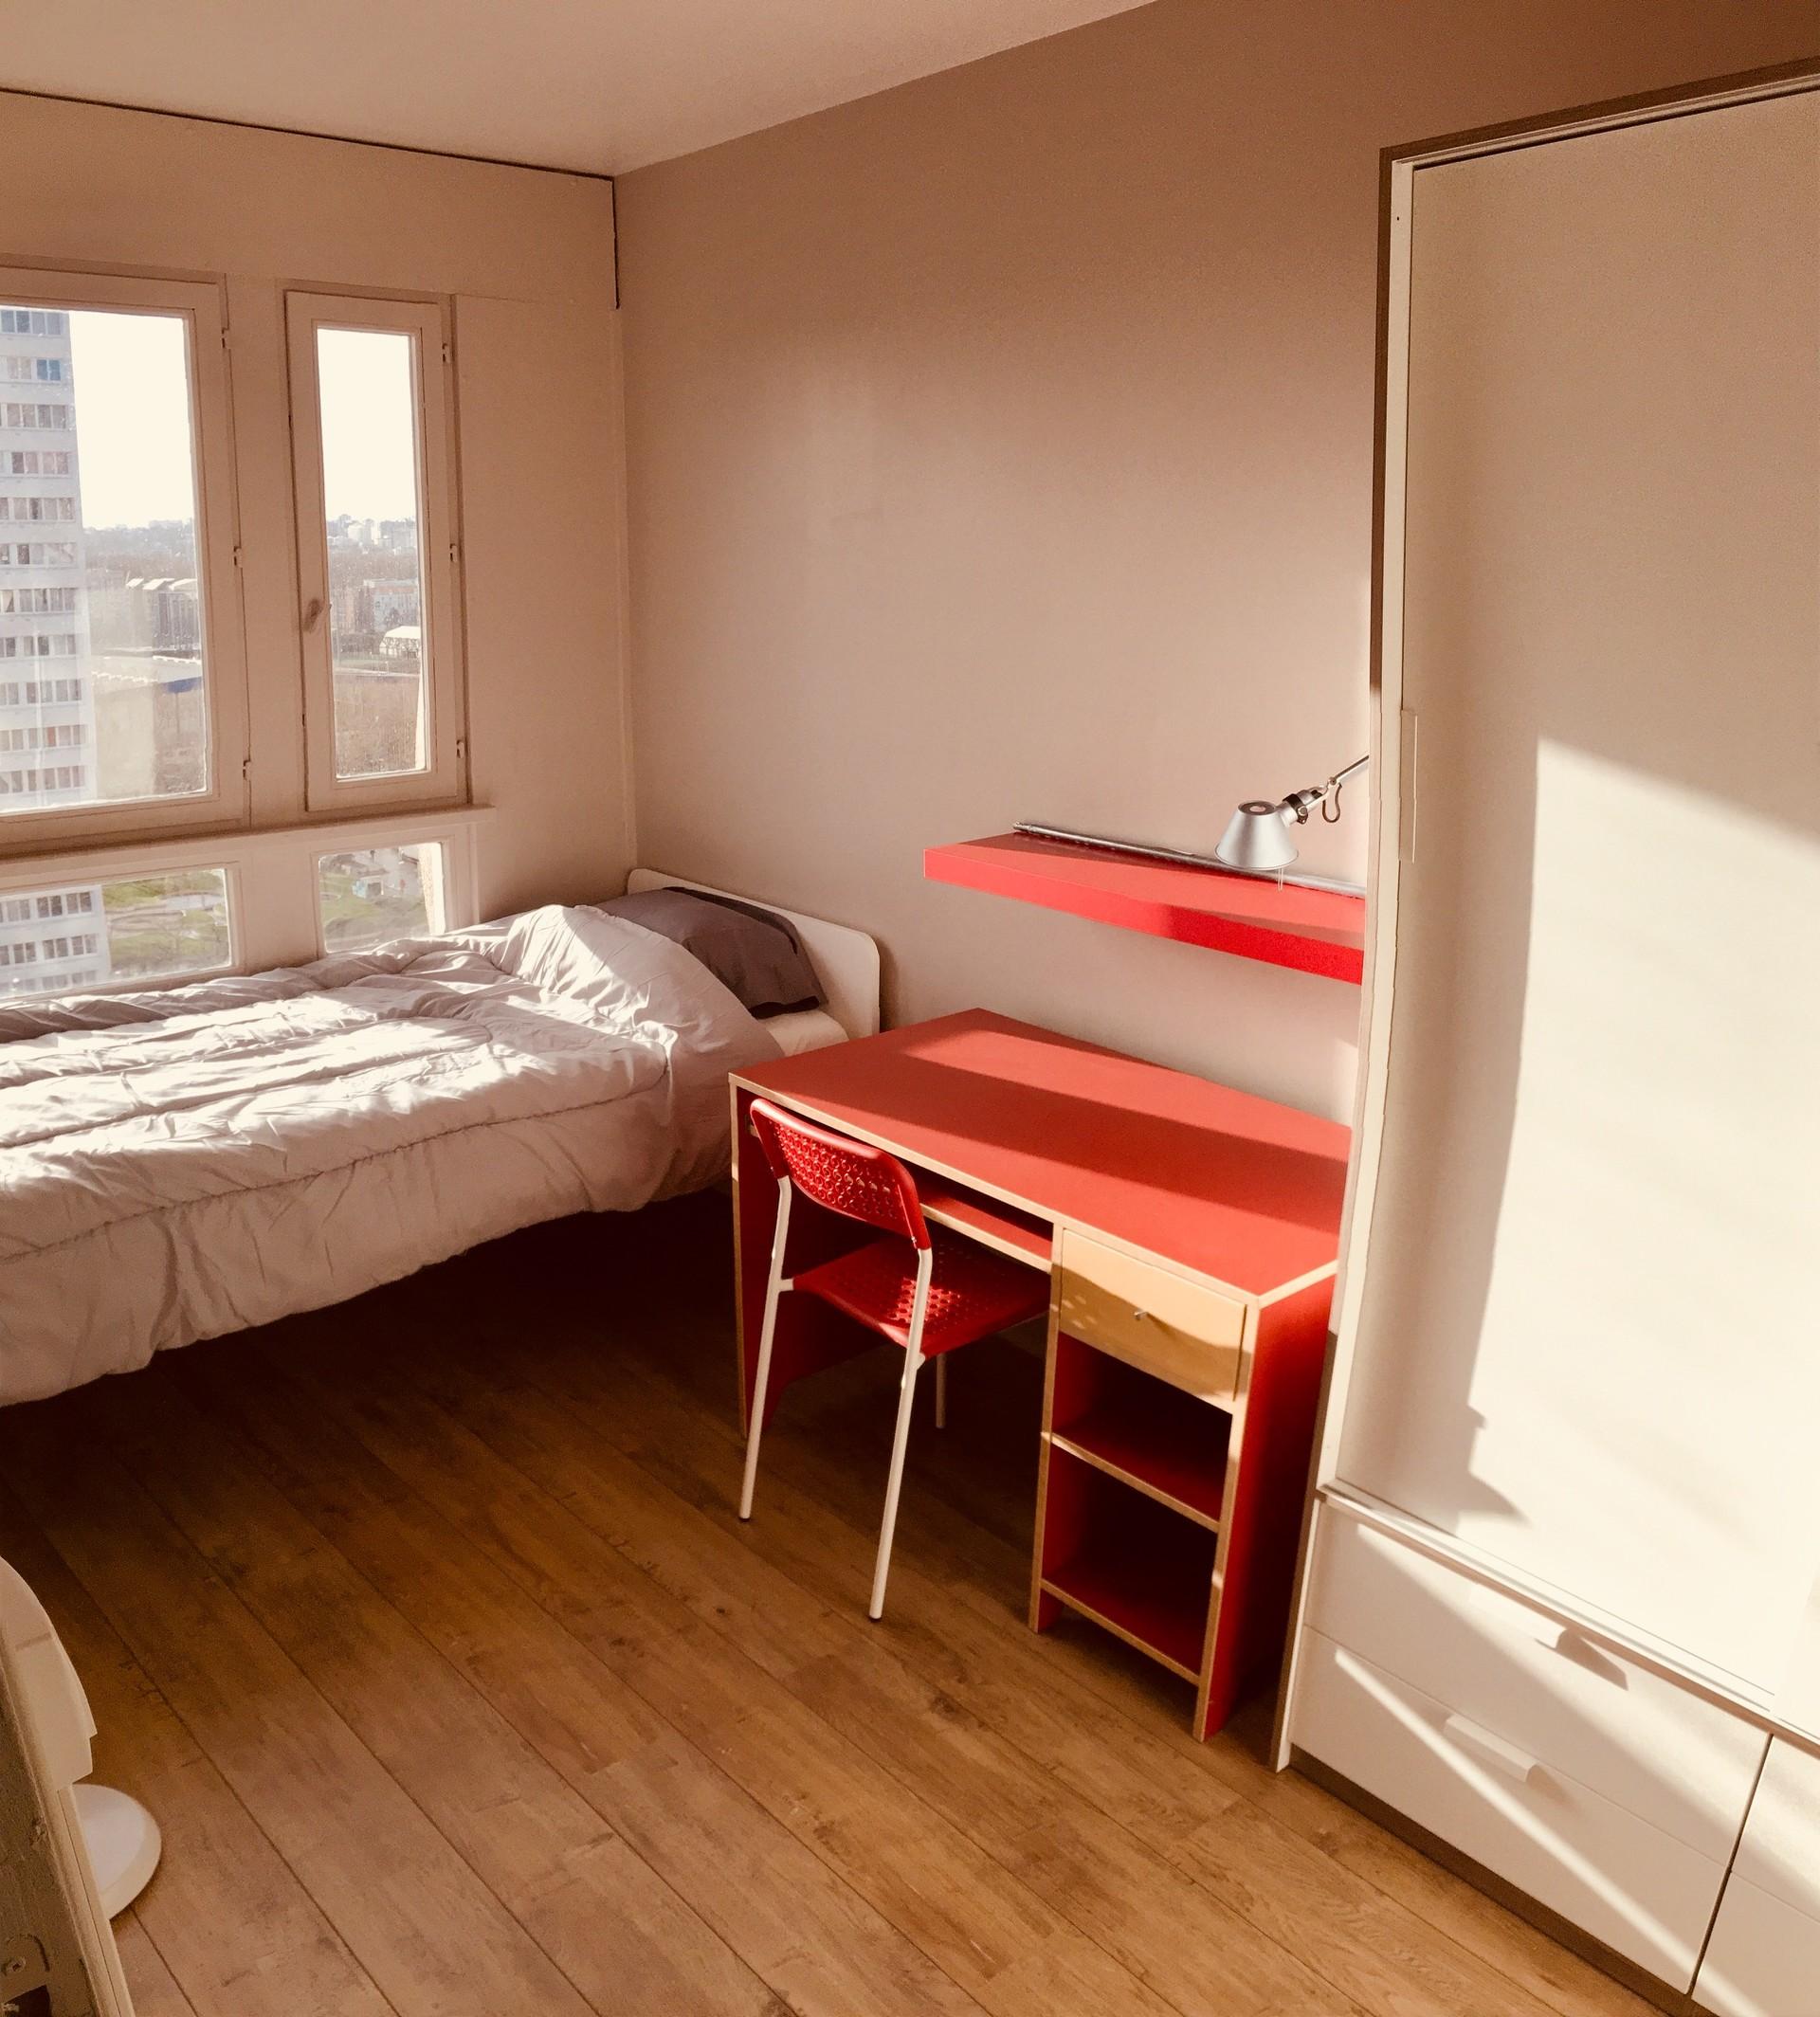 location chambre colocation paris